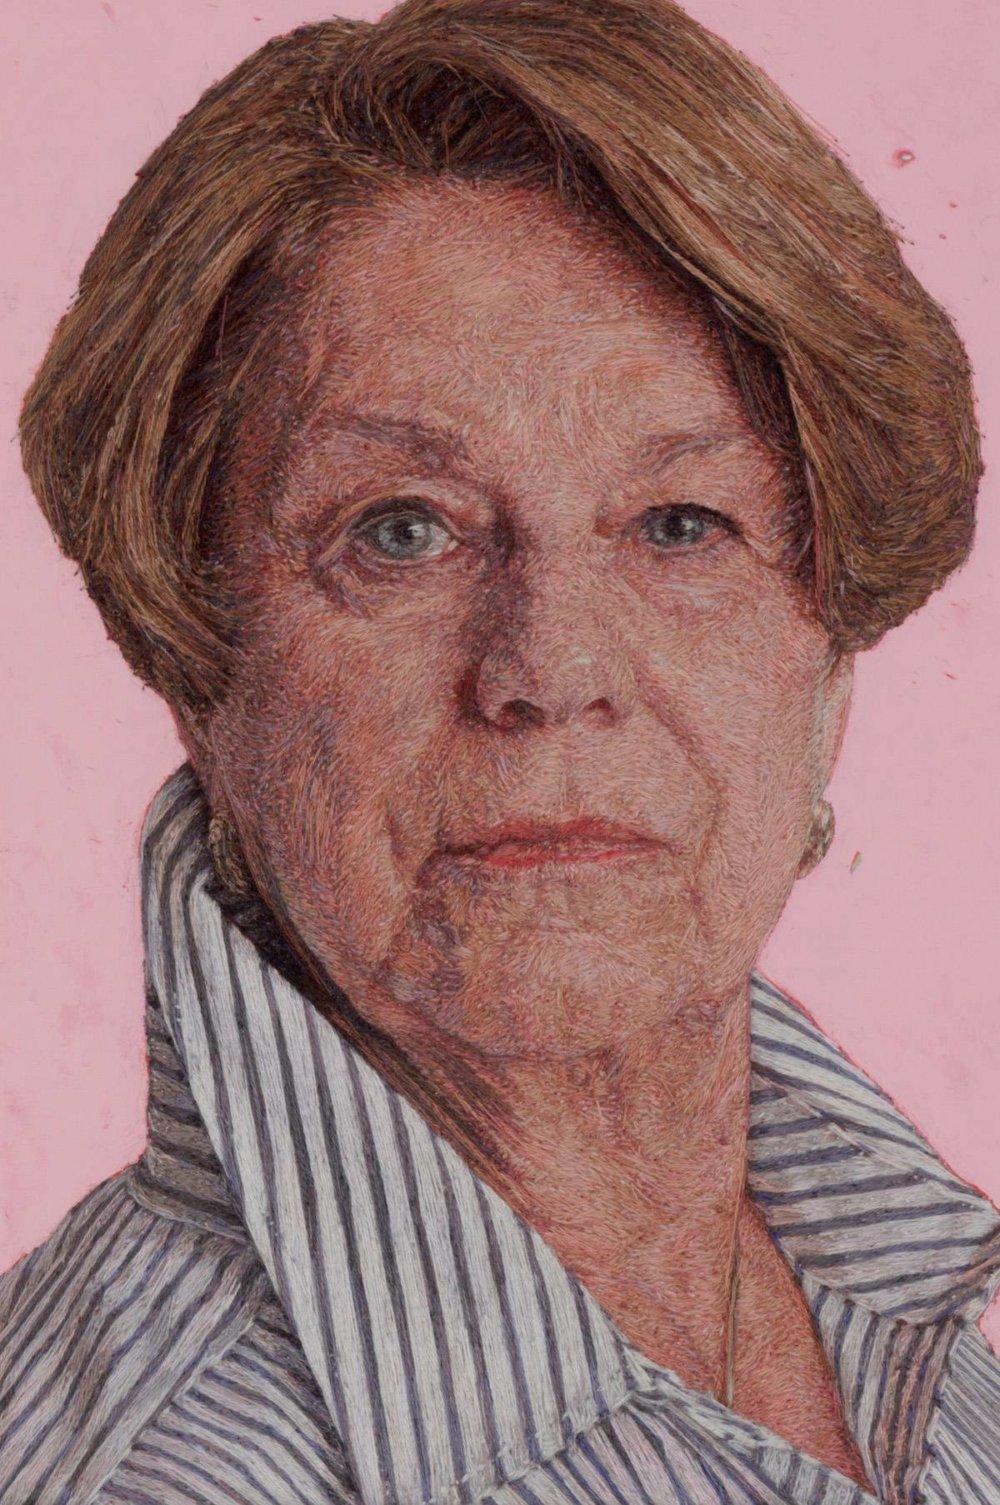 Realistic Embroidered Portraits By American Artist Cayce Zavaglia 10